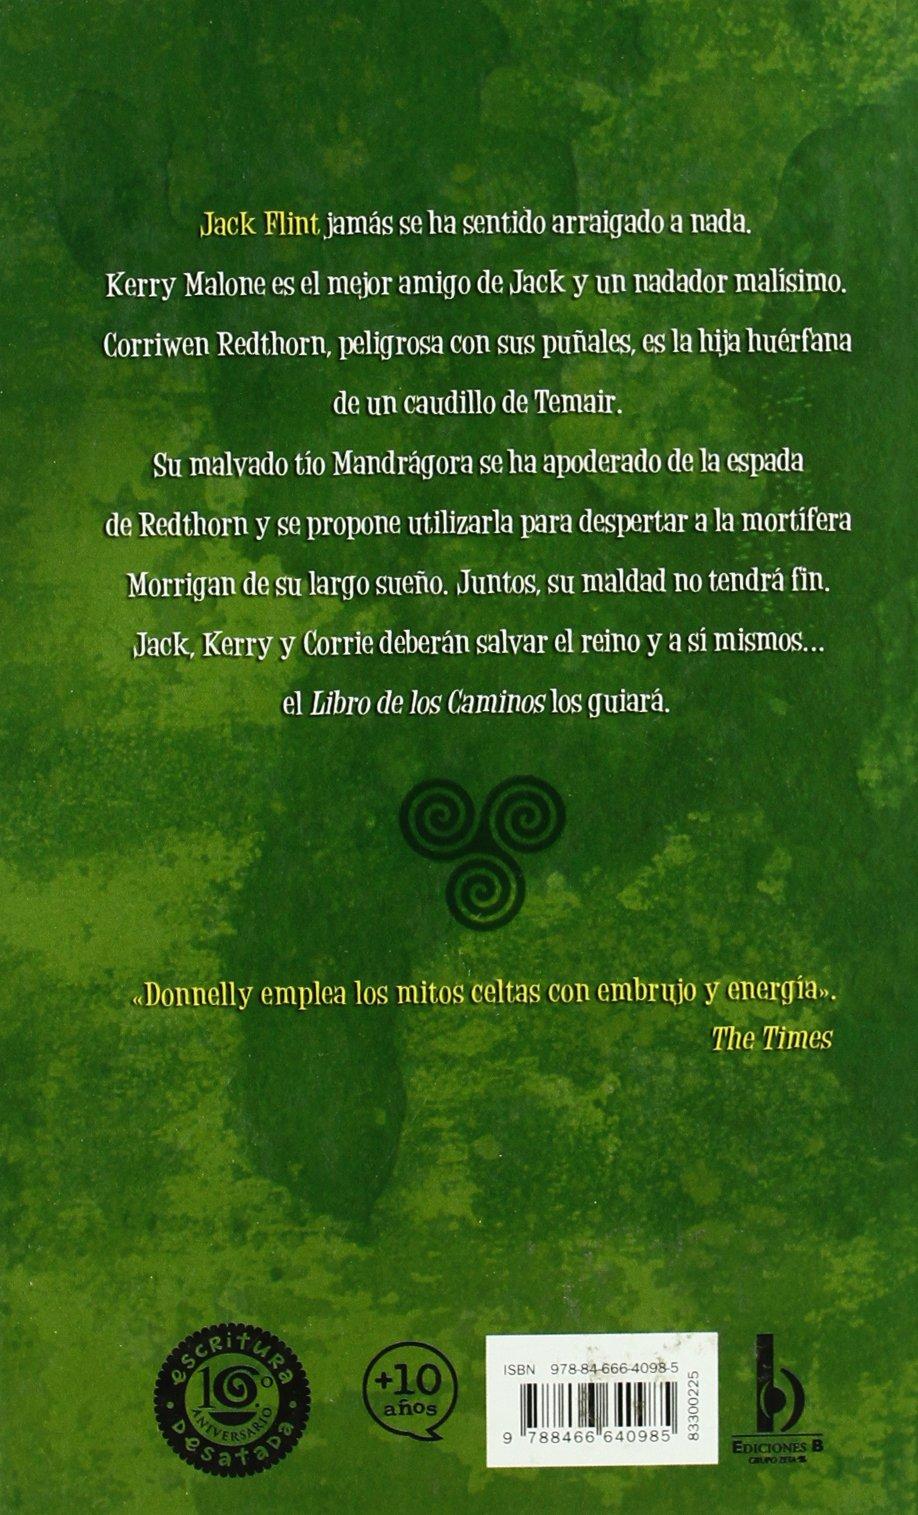 Amazon.com: Jack Flint y la Espada de Redthorn (Spanish Edition) (9788466640985): Joe Donnelly: Books